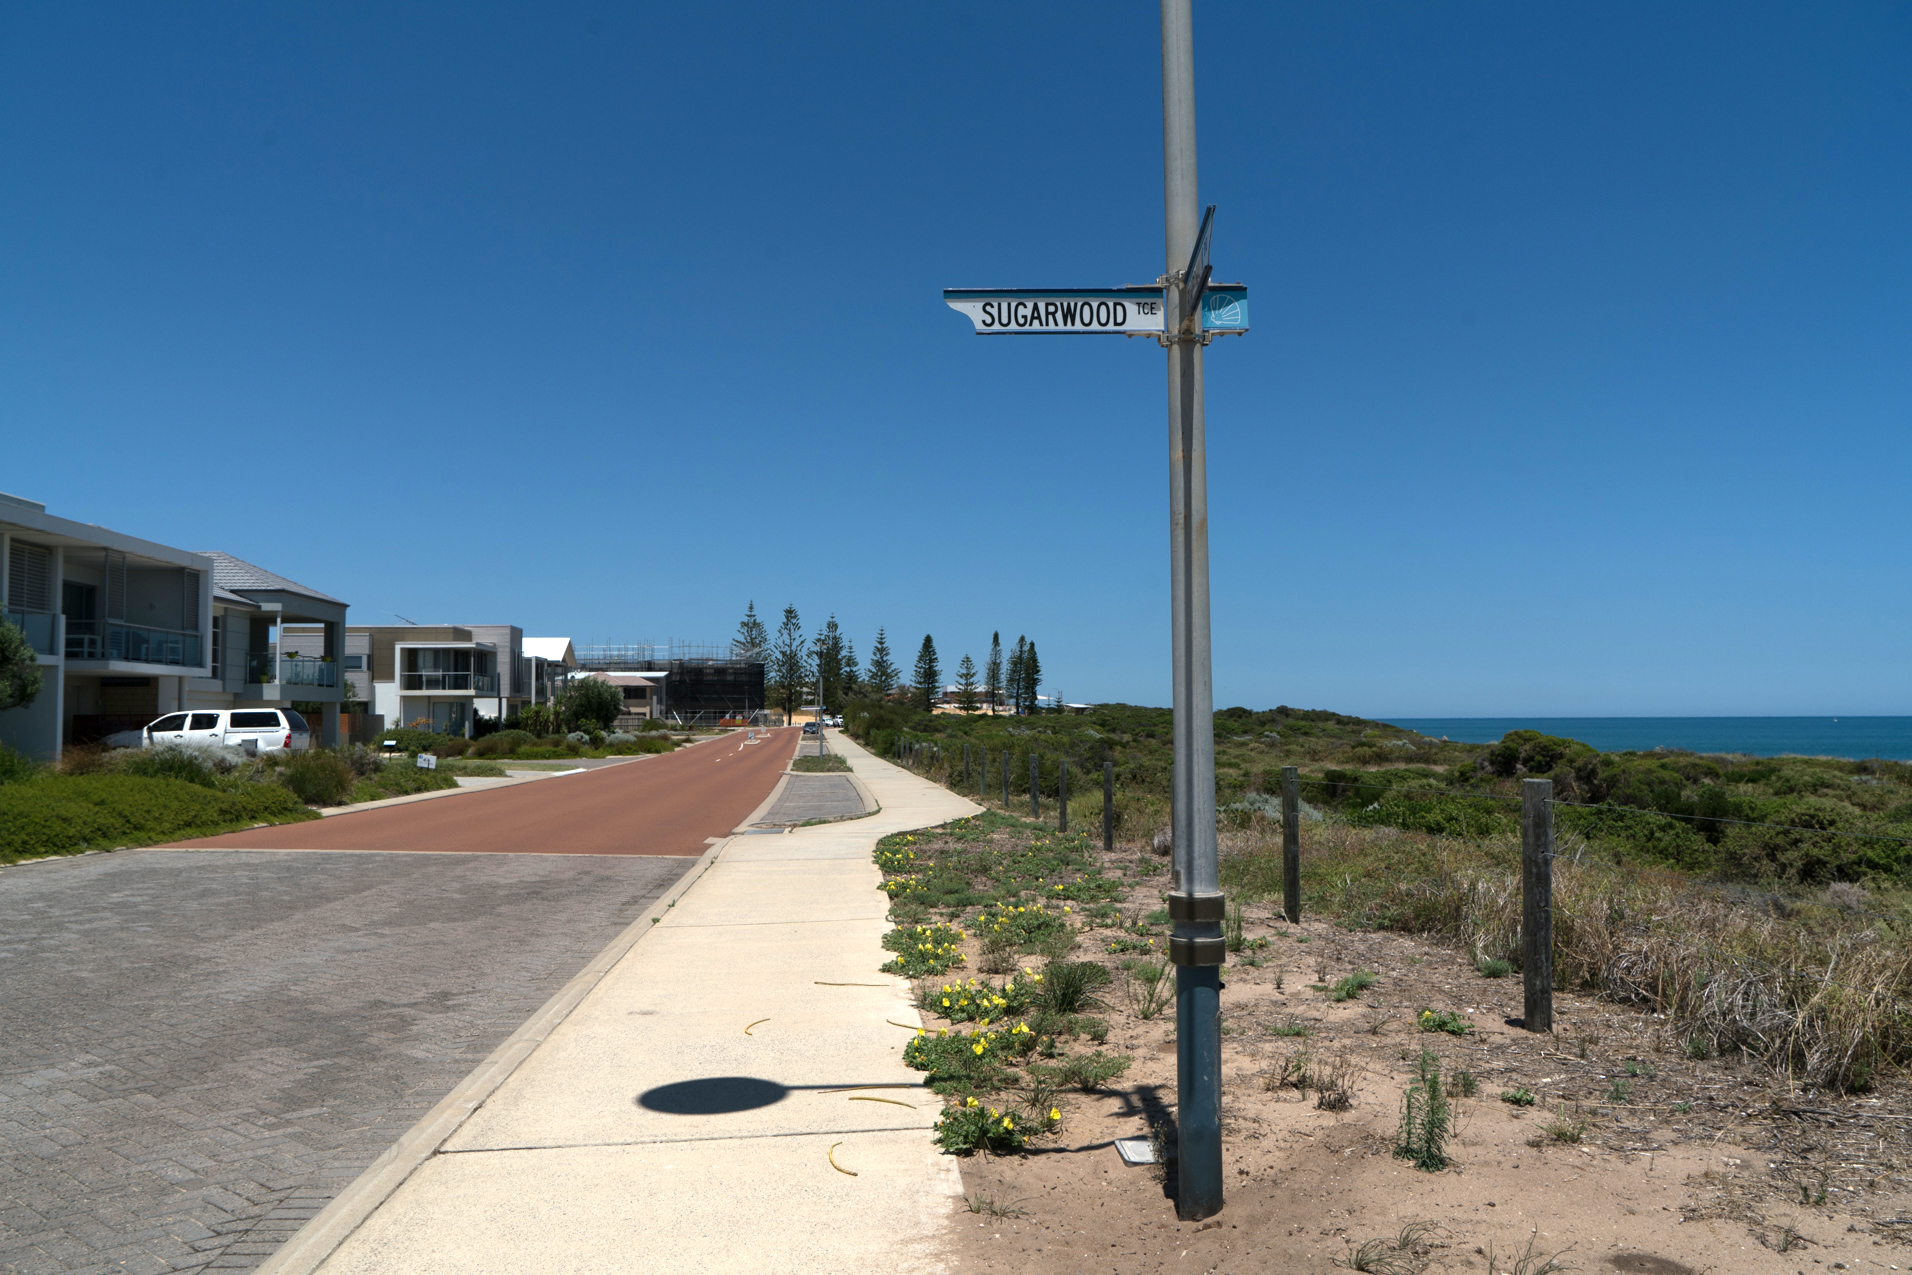 Plate 1: The path down Boardwalk Boulevard